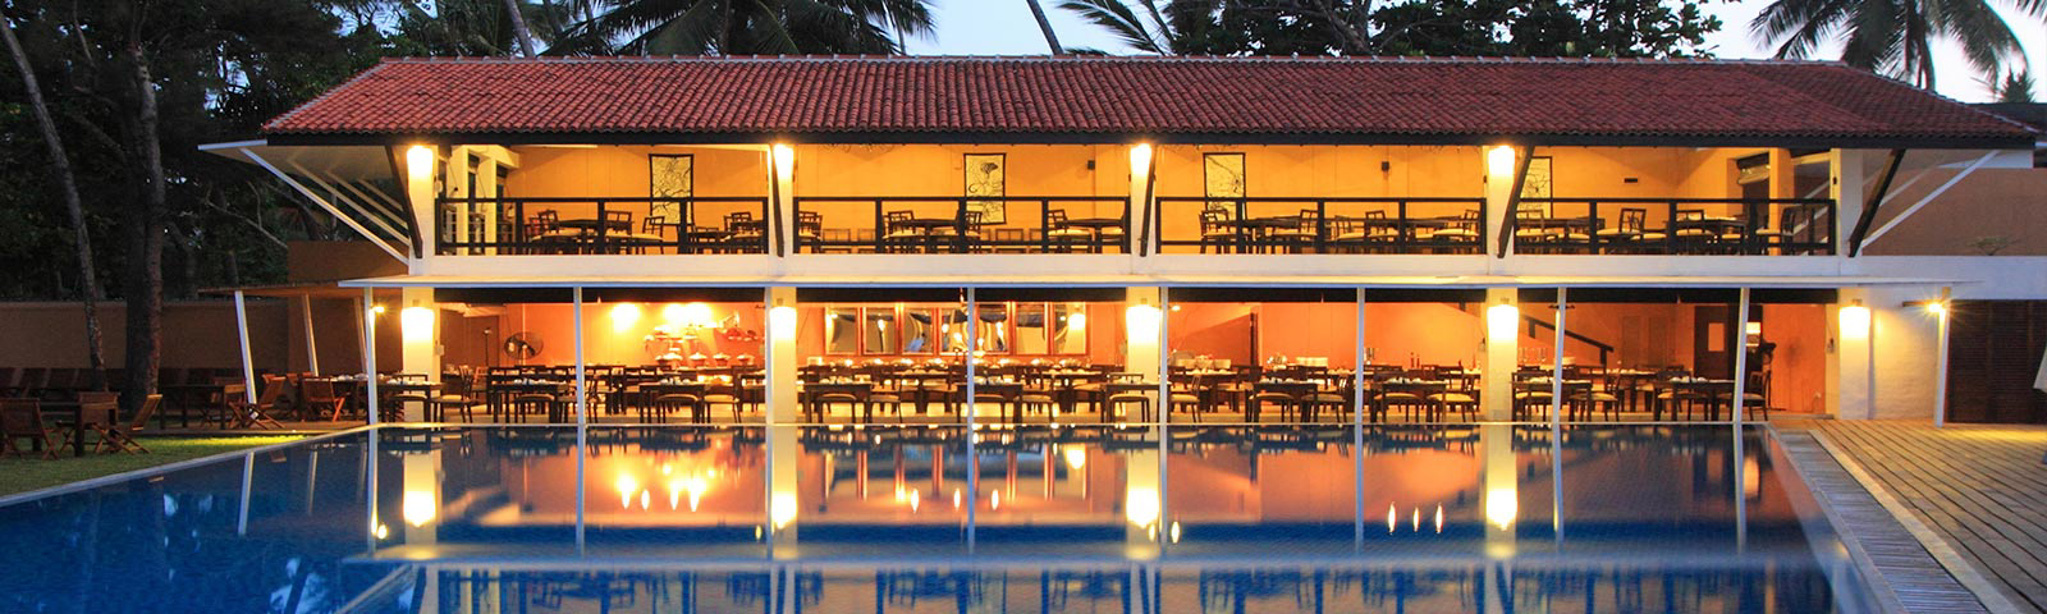 Avani Bentota Resort & Spa is a hotel in Bentota